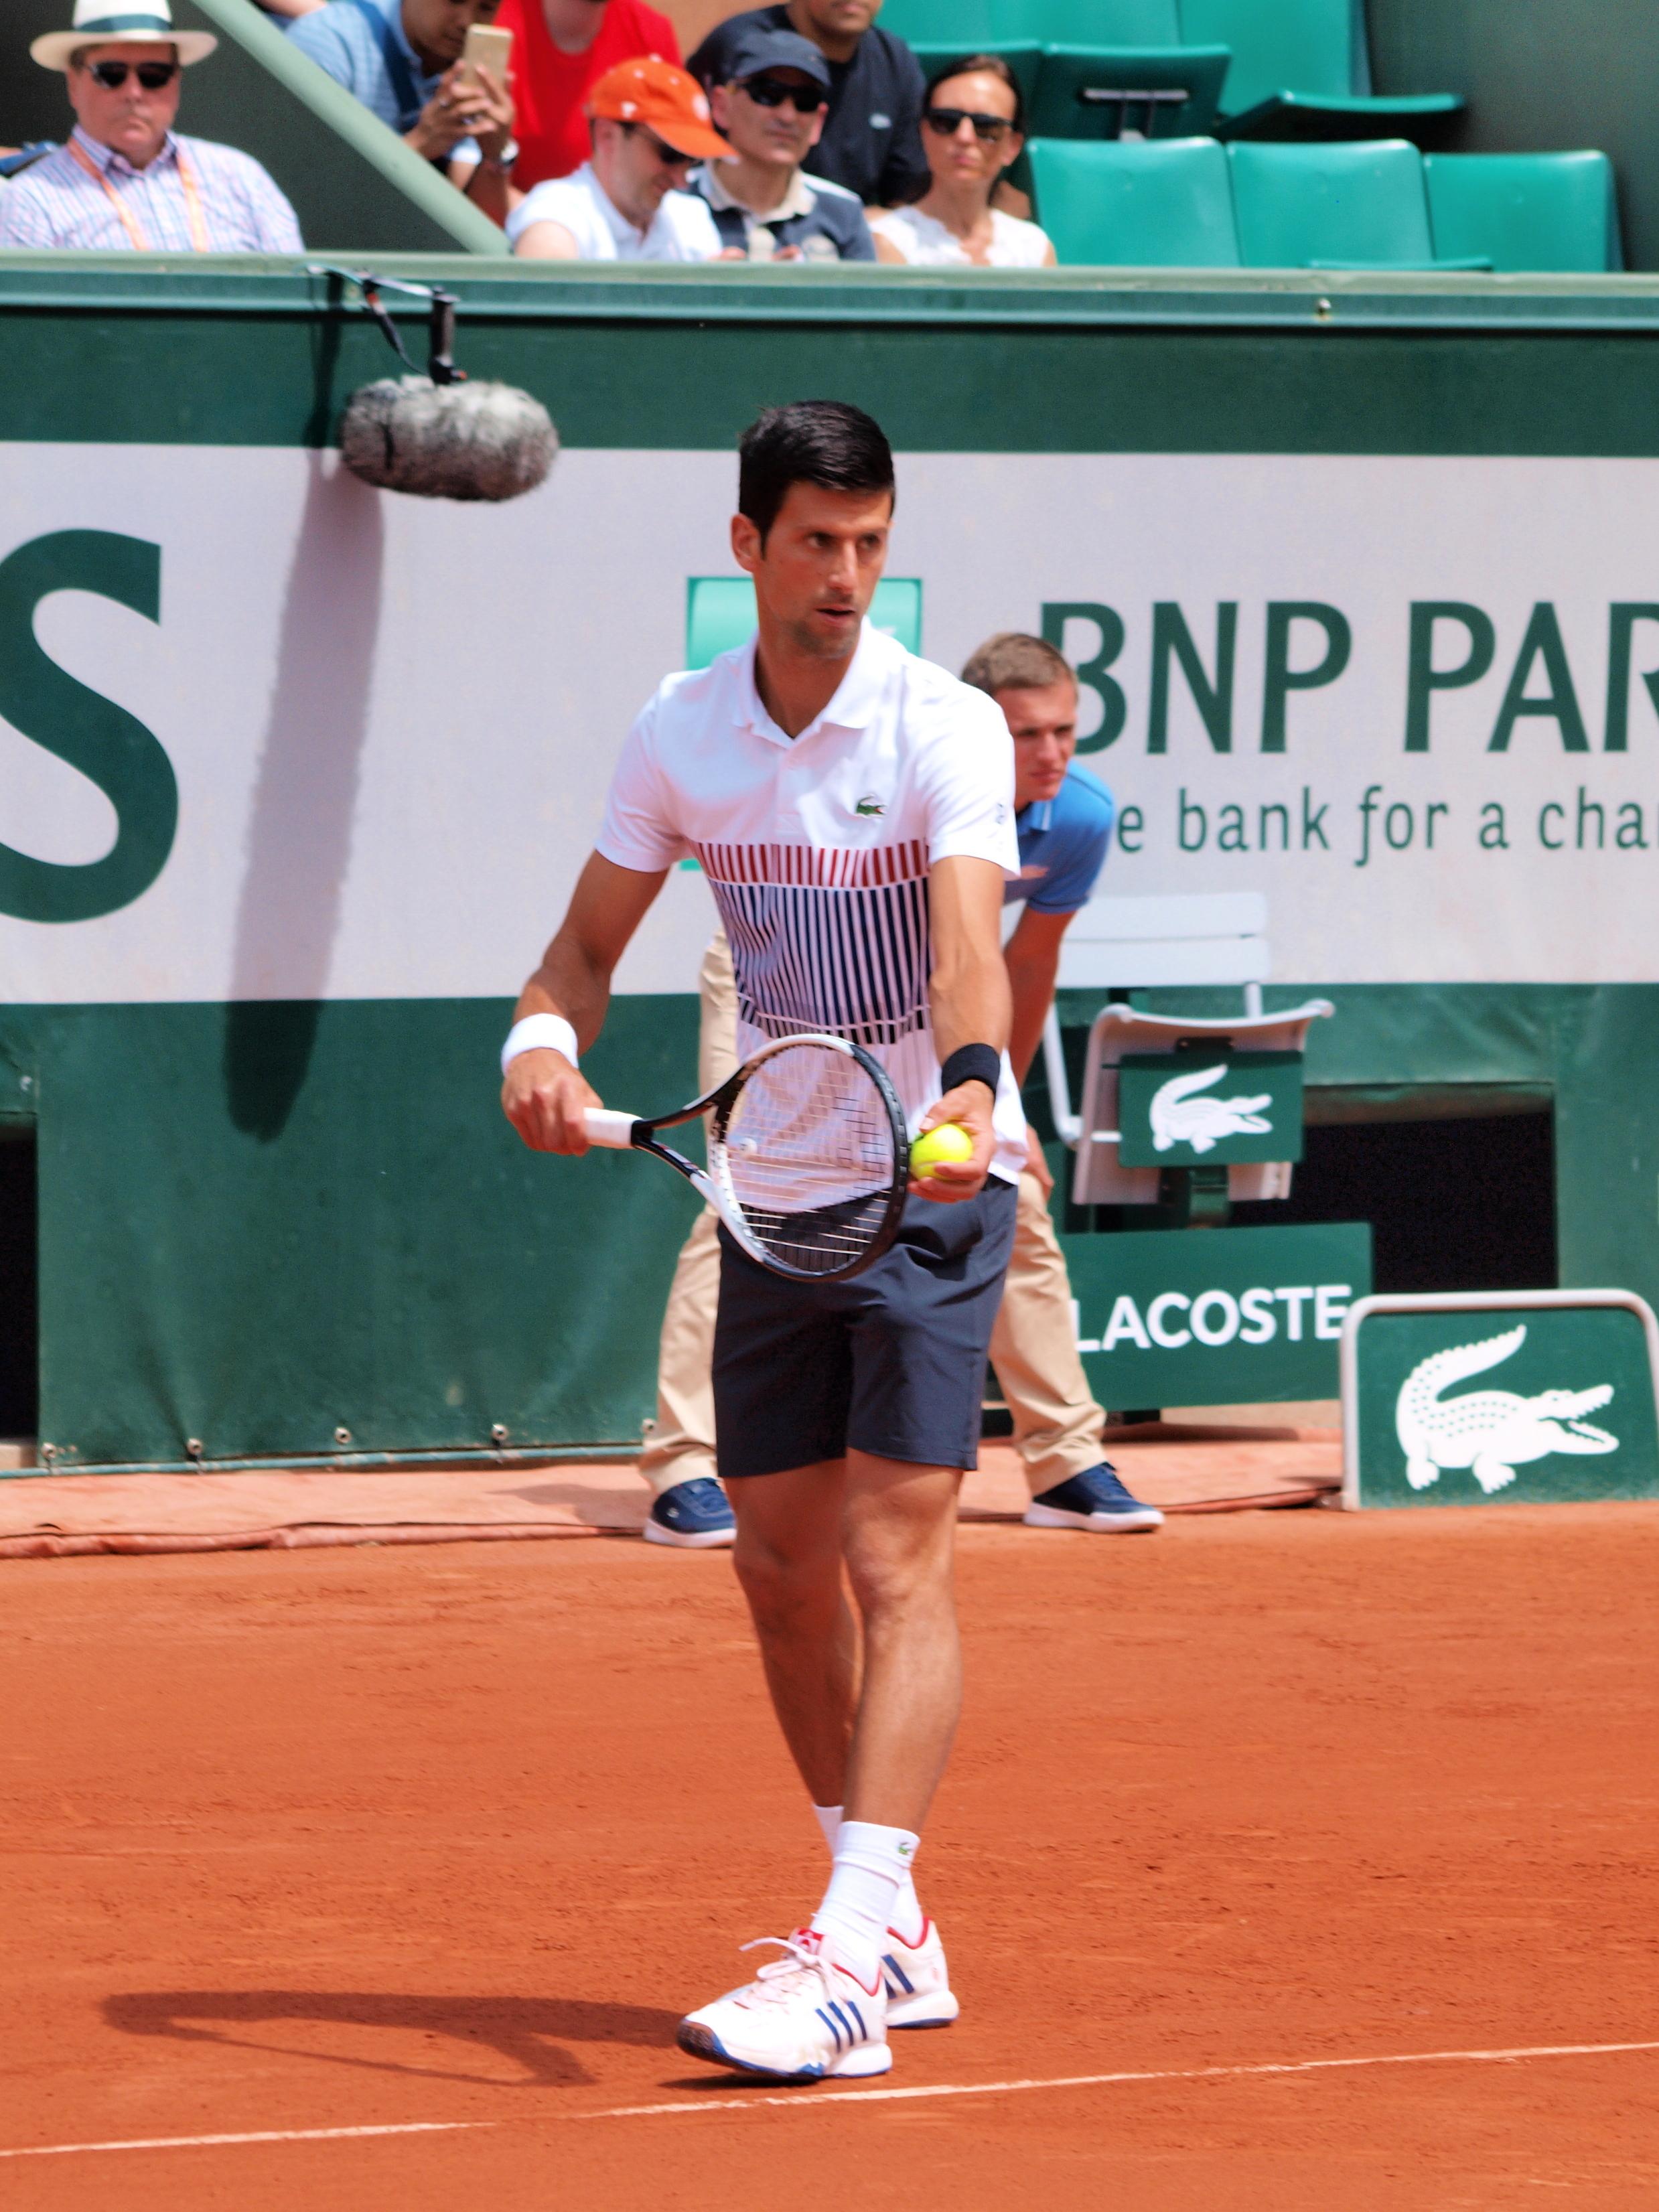 File Paris Fr 75 Open De Tennis 31 5 17 Roland Garros Novak Djokovic 13 Jpg Wikimedia Commons